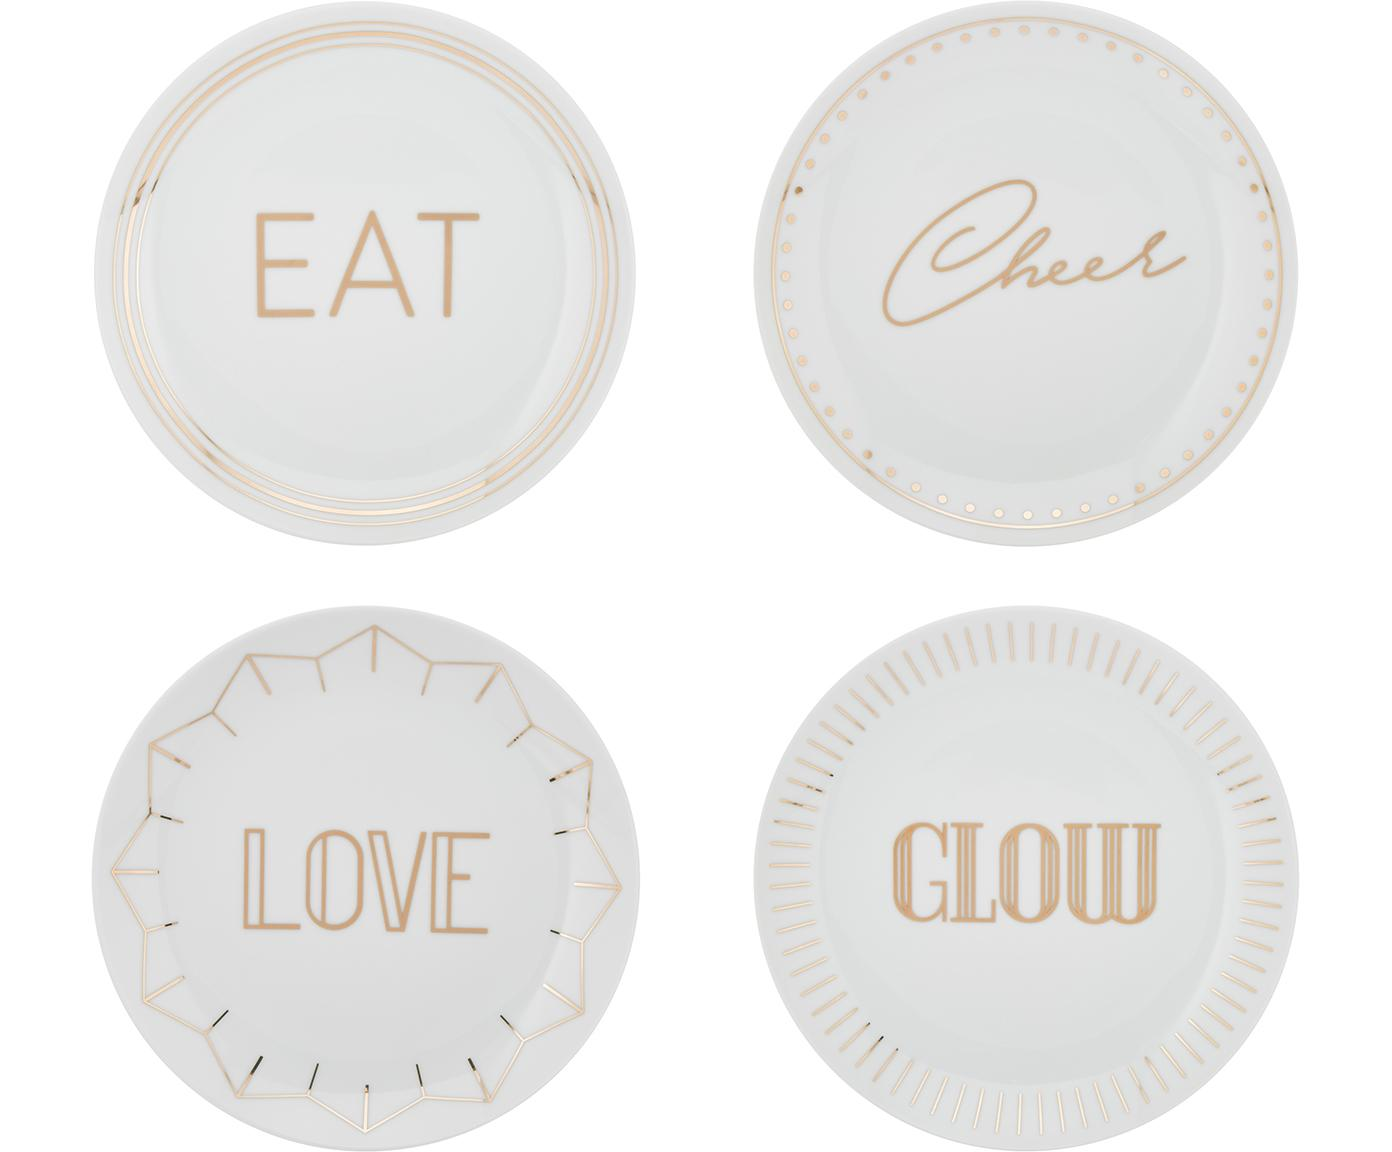 Porseleinen ontbijtborden Glimmer met goudkleurig opschrift, 4 stuks, Porselein, Wit, goudkleurig, Ø 21 cm